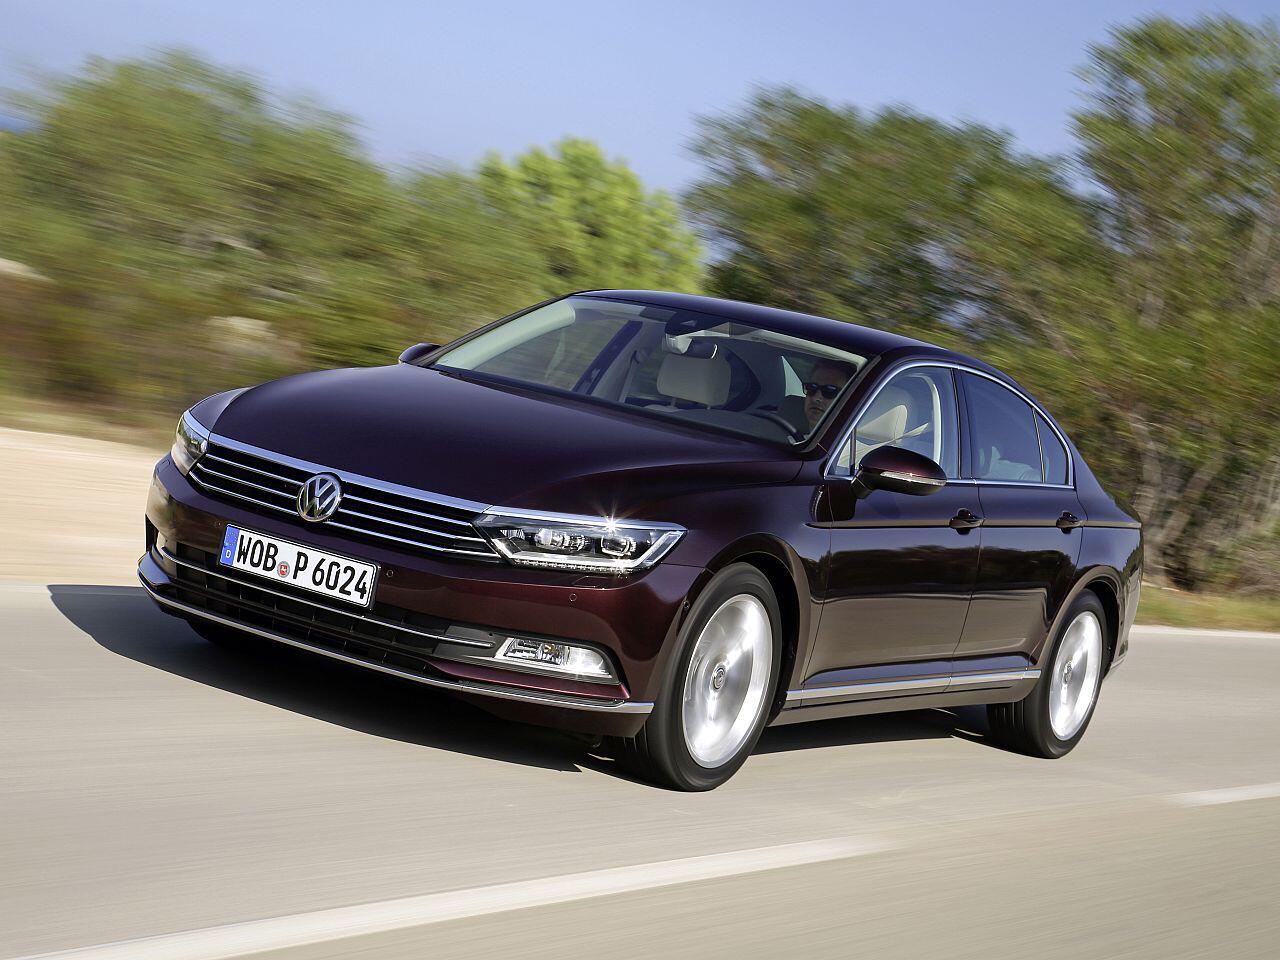 Bild zu Platz 12: VW Passat